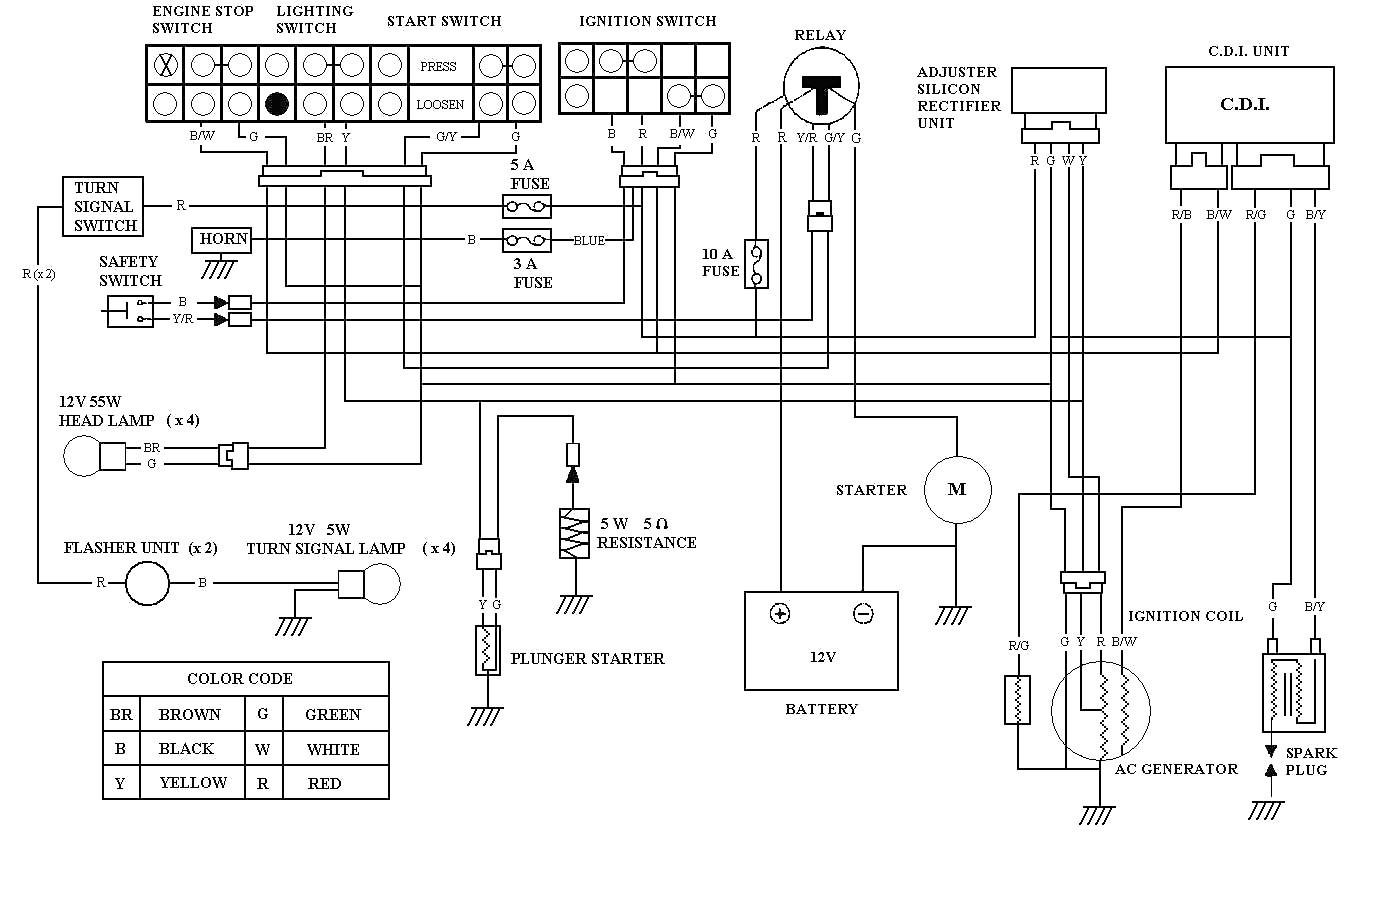 Stator Wiring Diagram - Wiring Diagrams List on